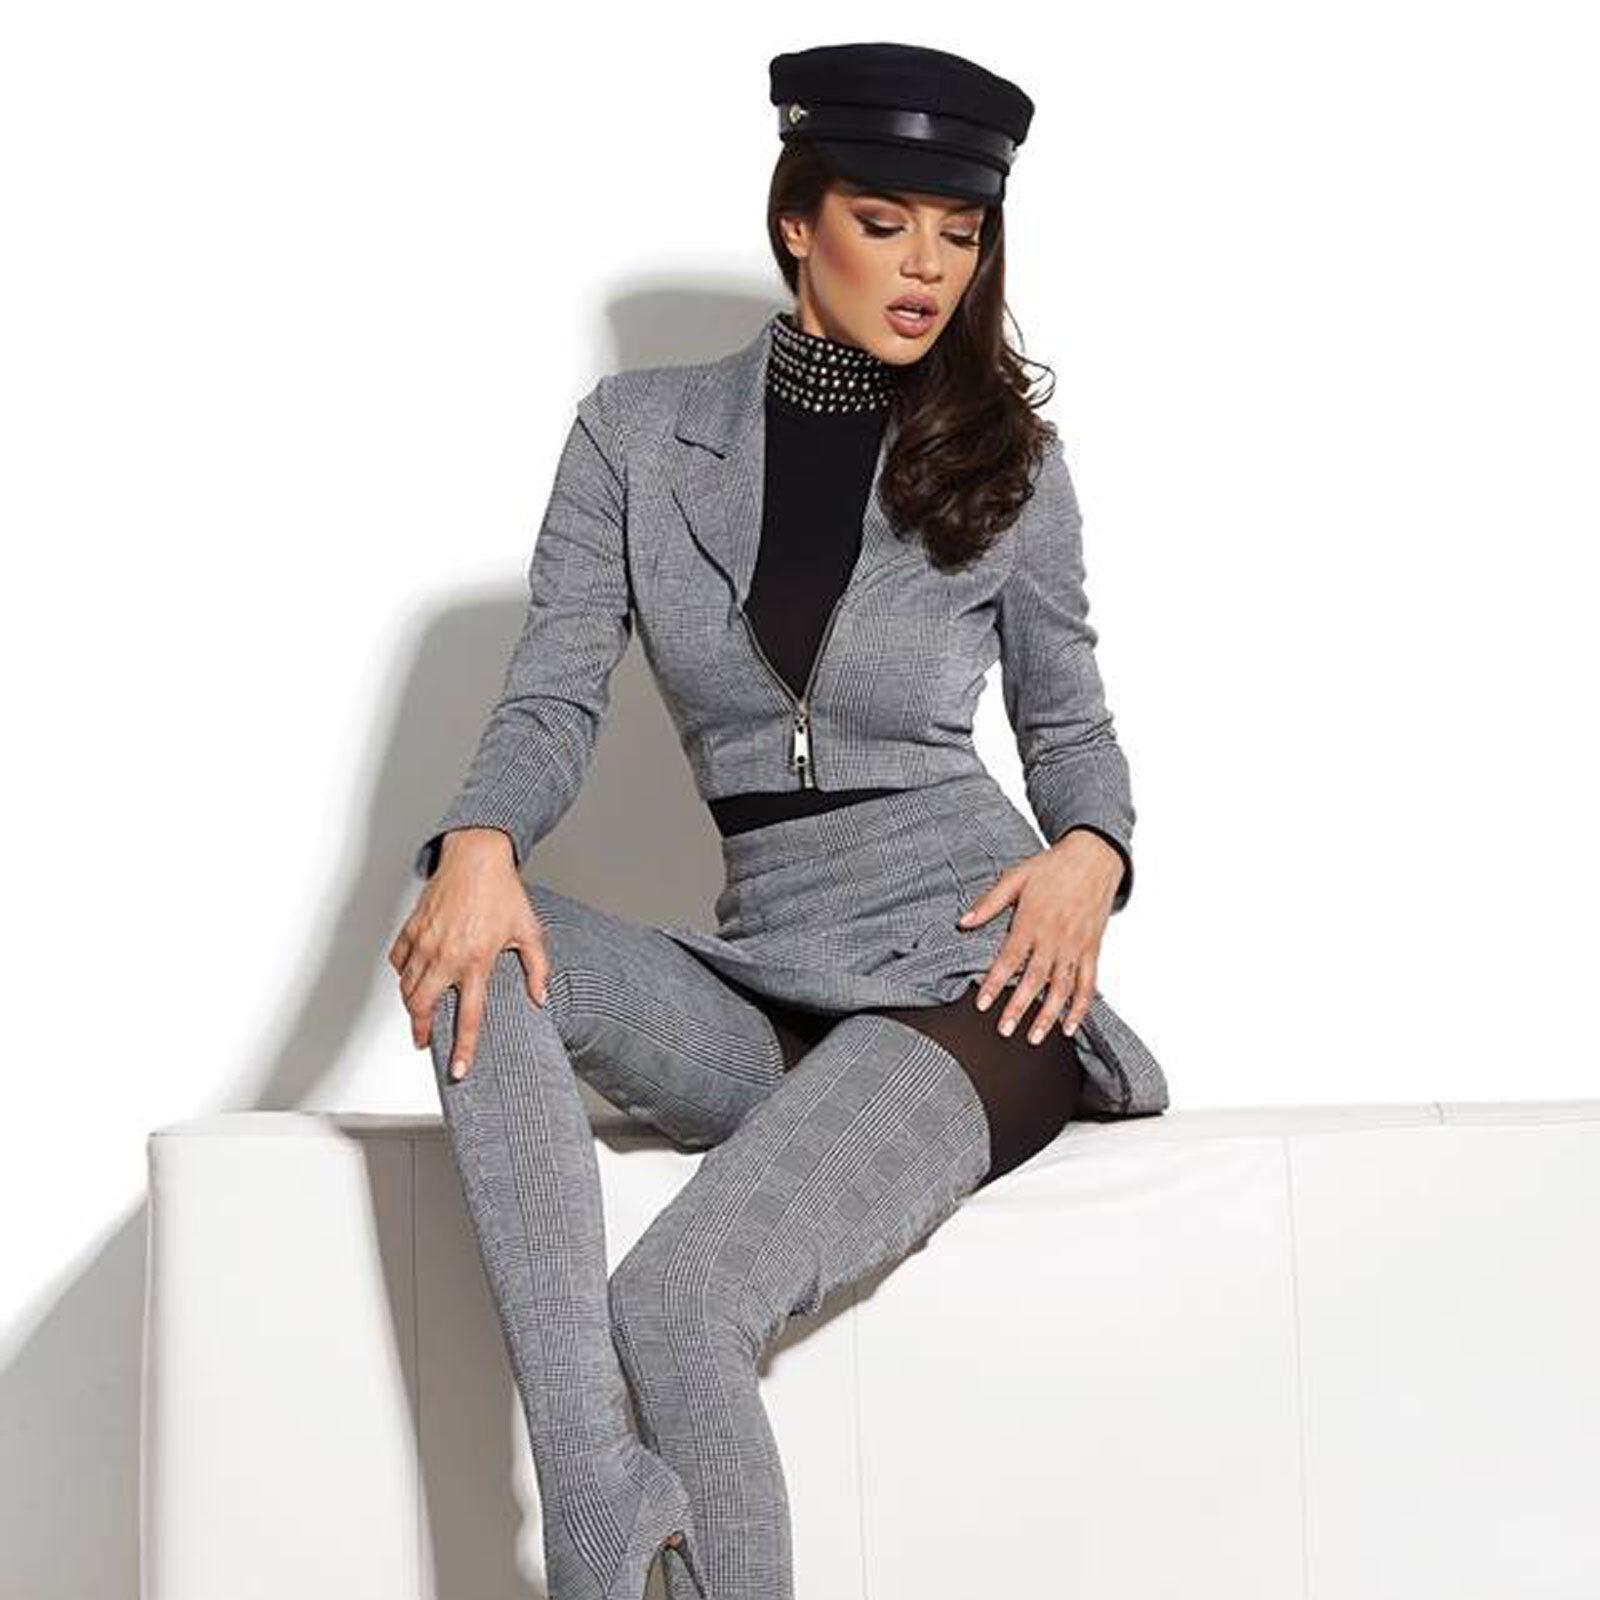 By Alina sexy 2-Divisorio Blazer + MINIGONNA PENCILROCK Donna Giacca Gonna Grigio XS-M